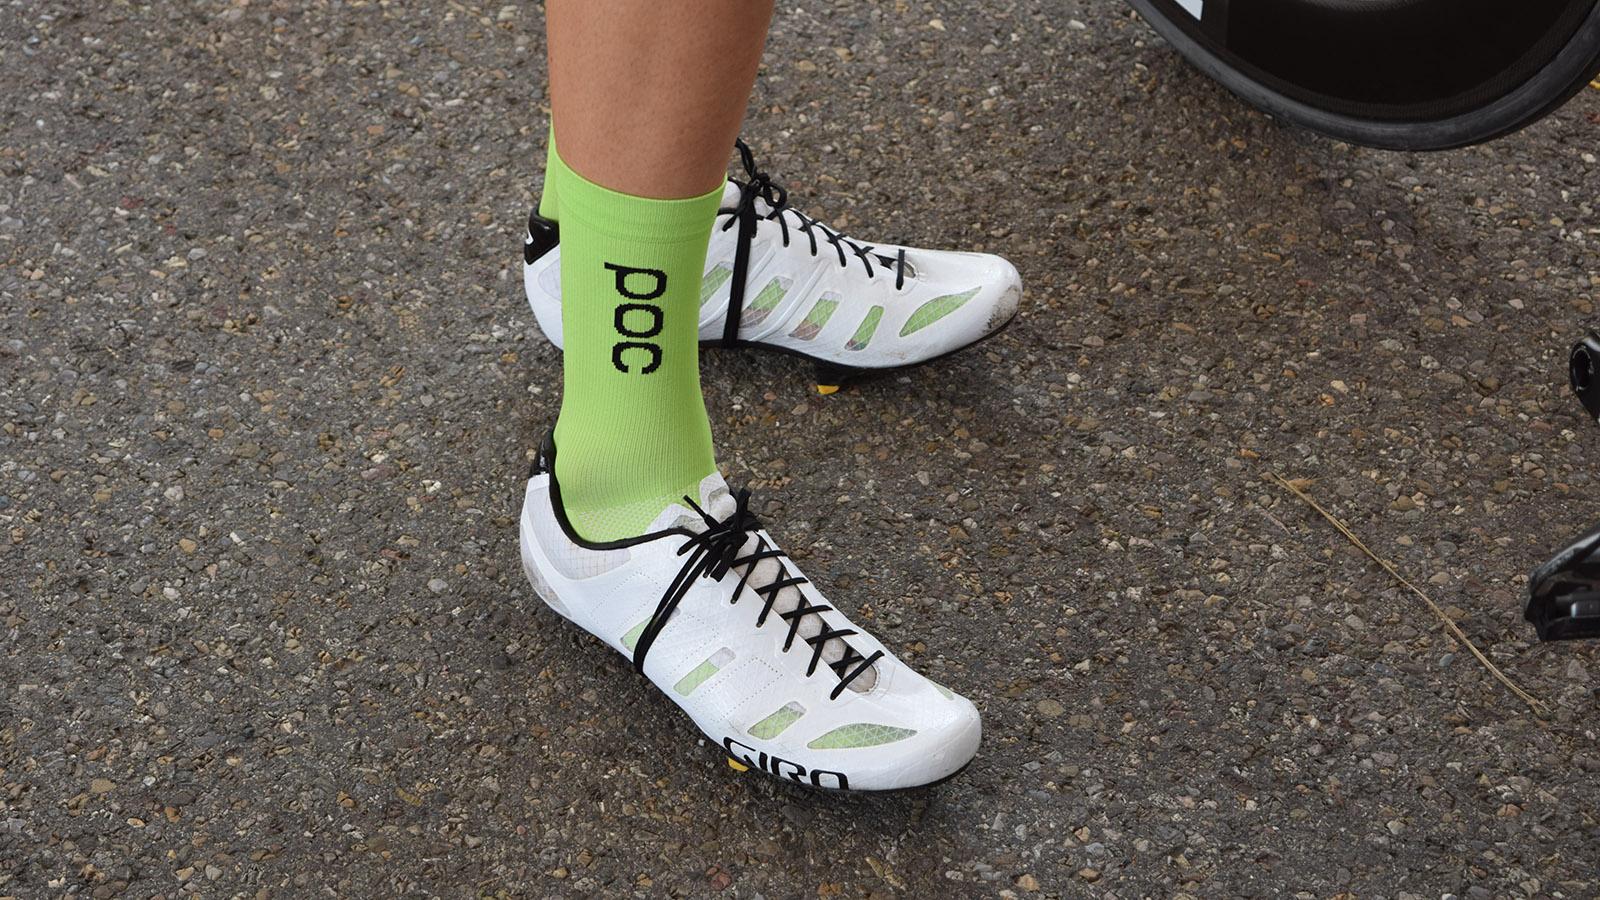 Unseen shoes from Giro at Tour de